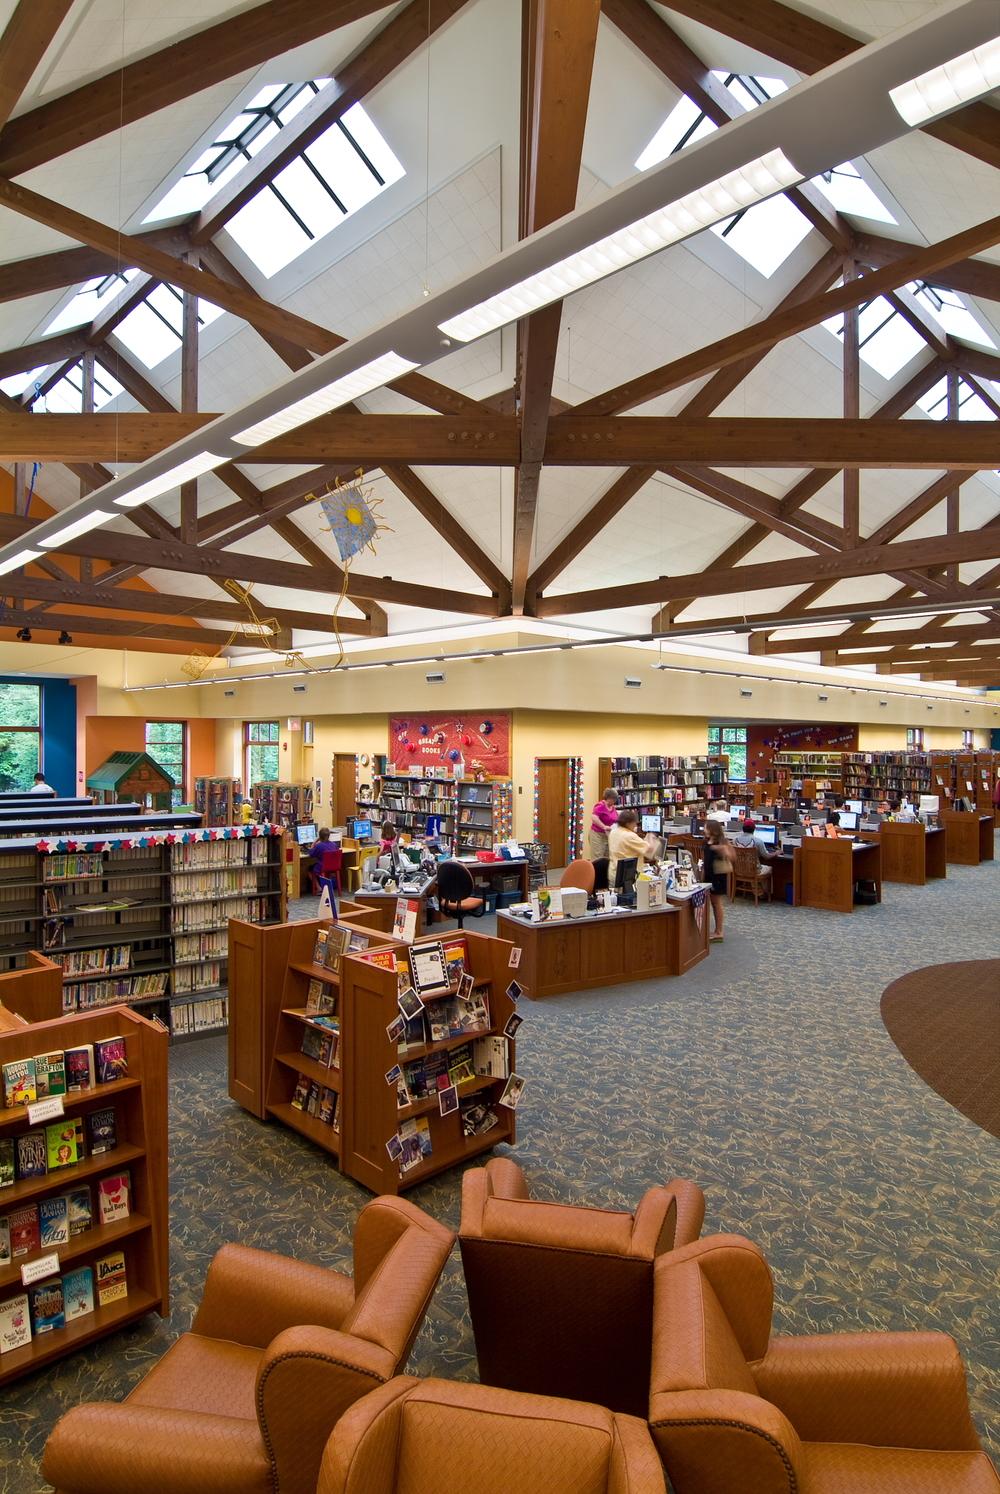 Brecksville_Public Library03.JPG